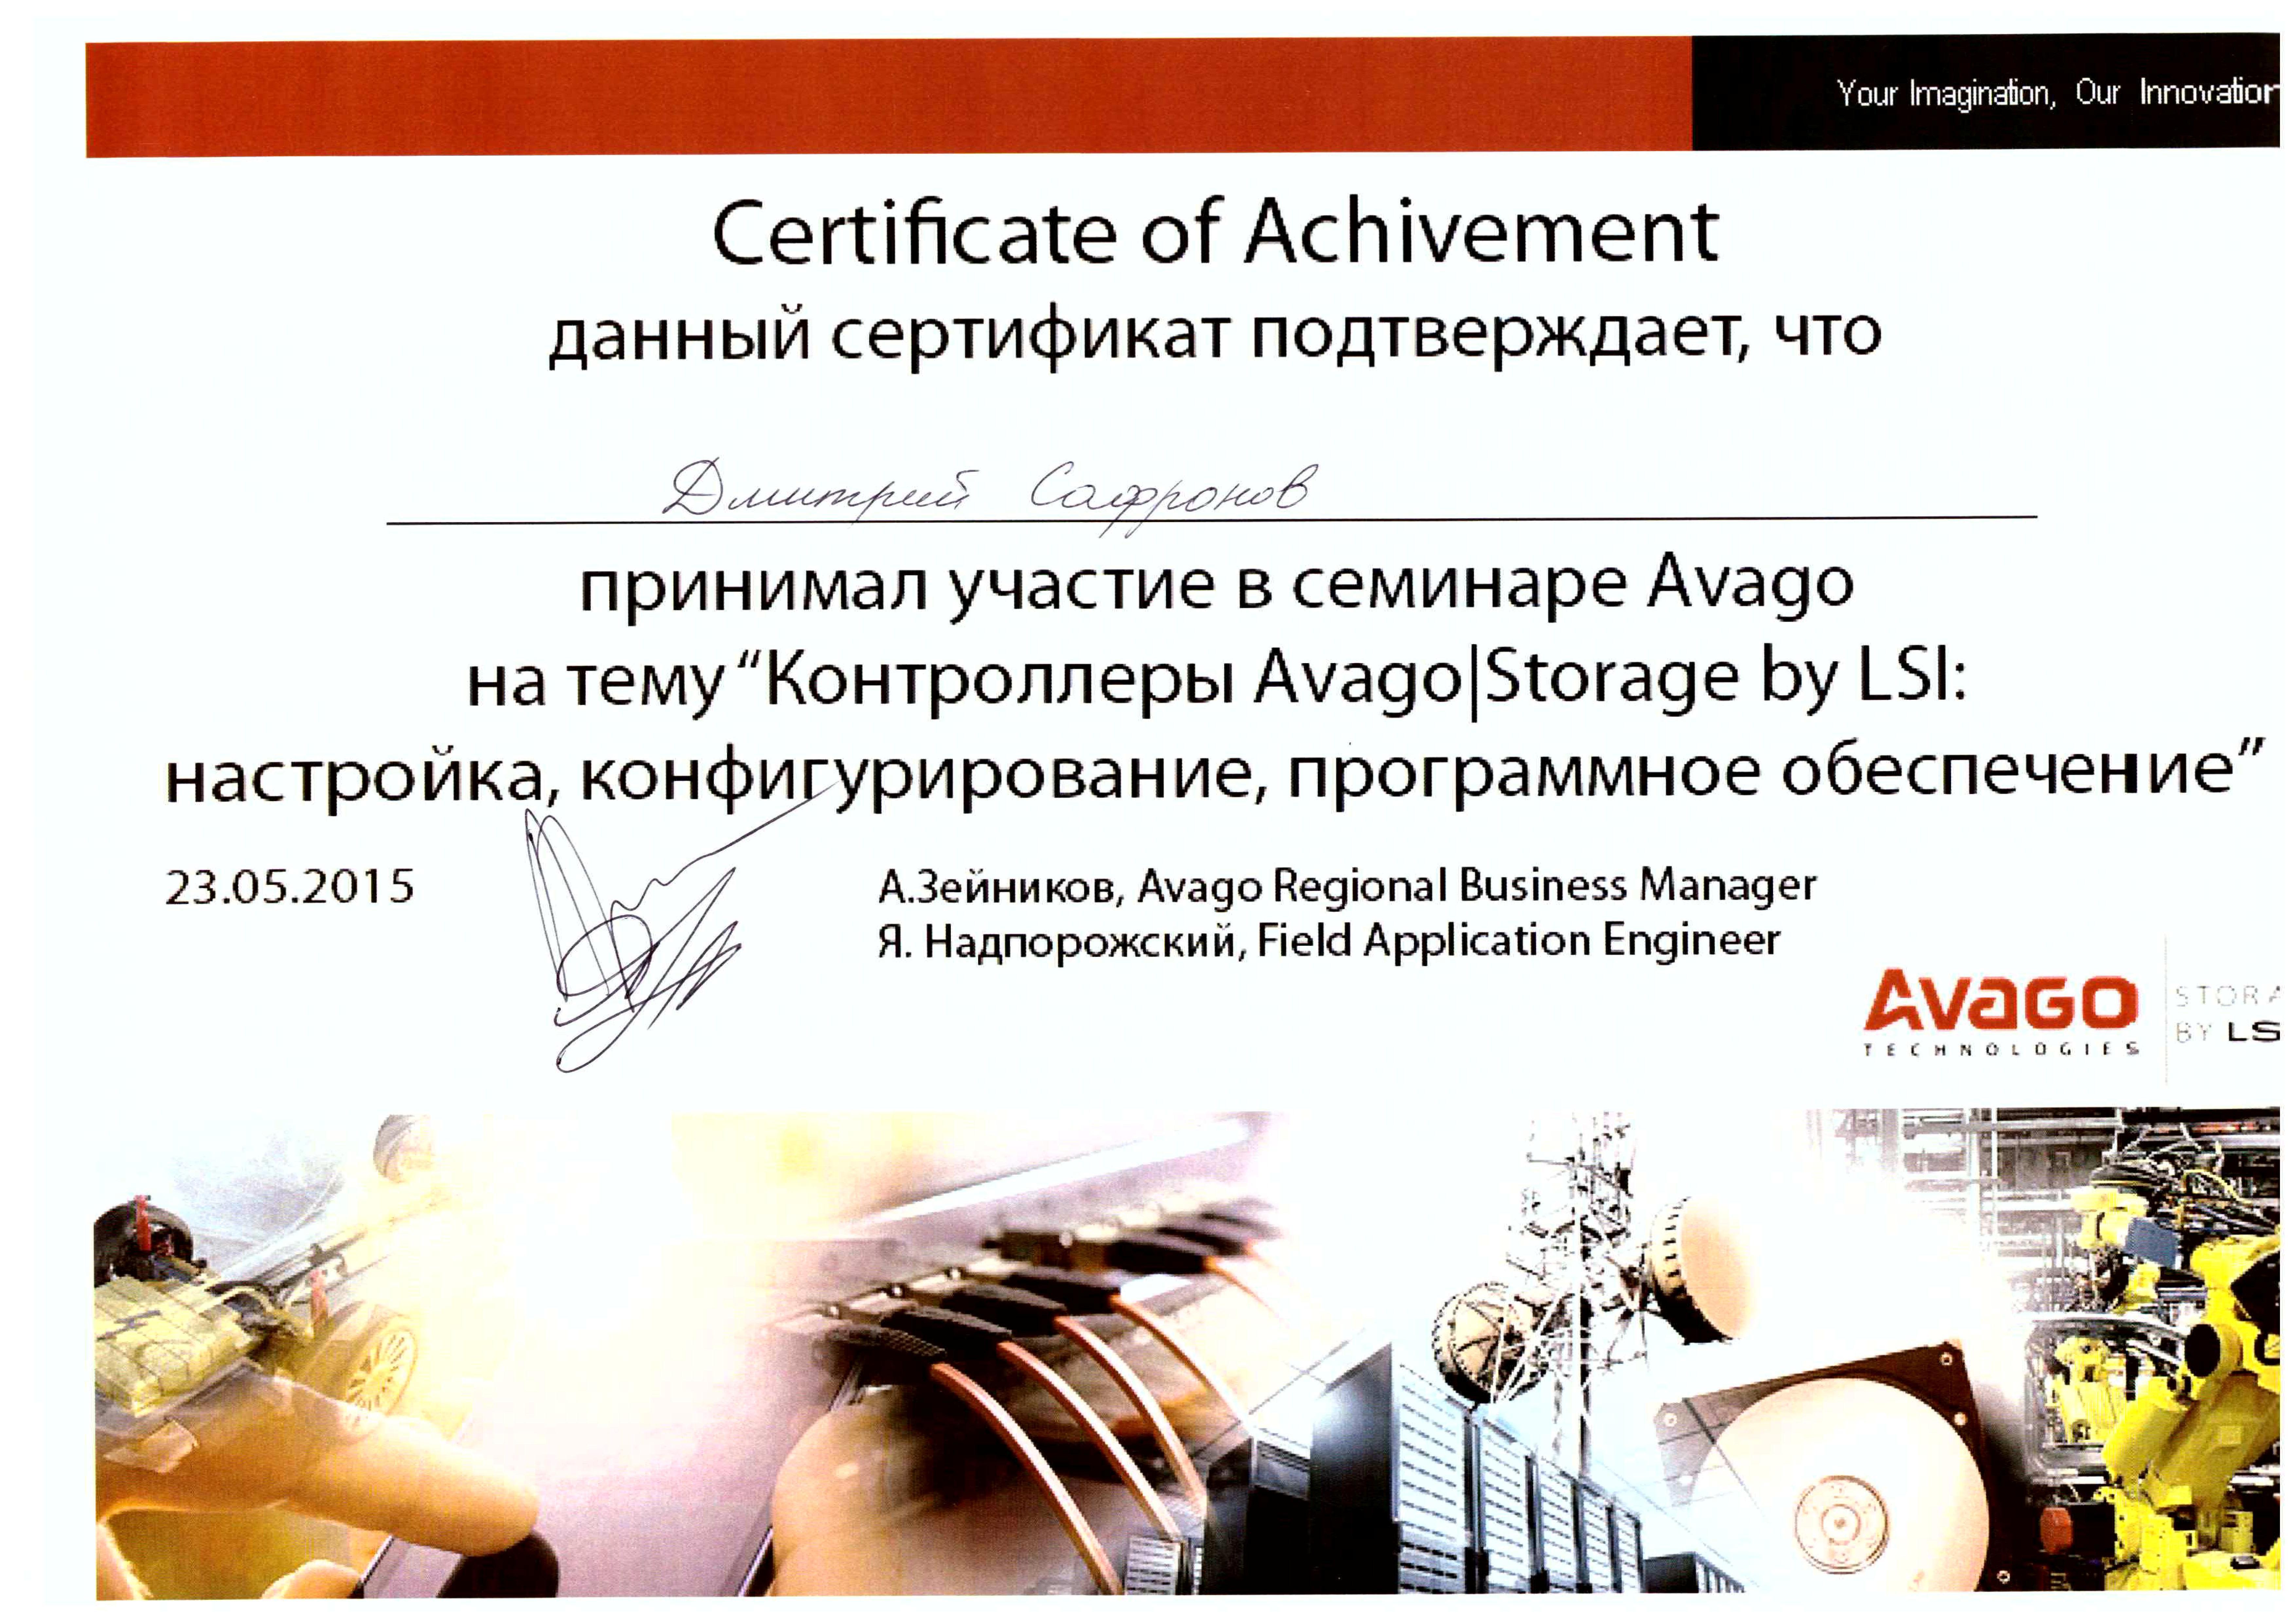 Сертификат Avago-Сафронов Дмитрий